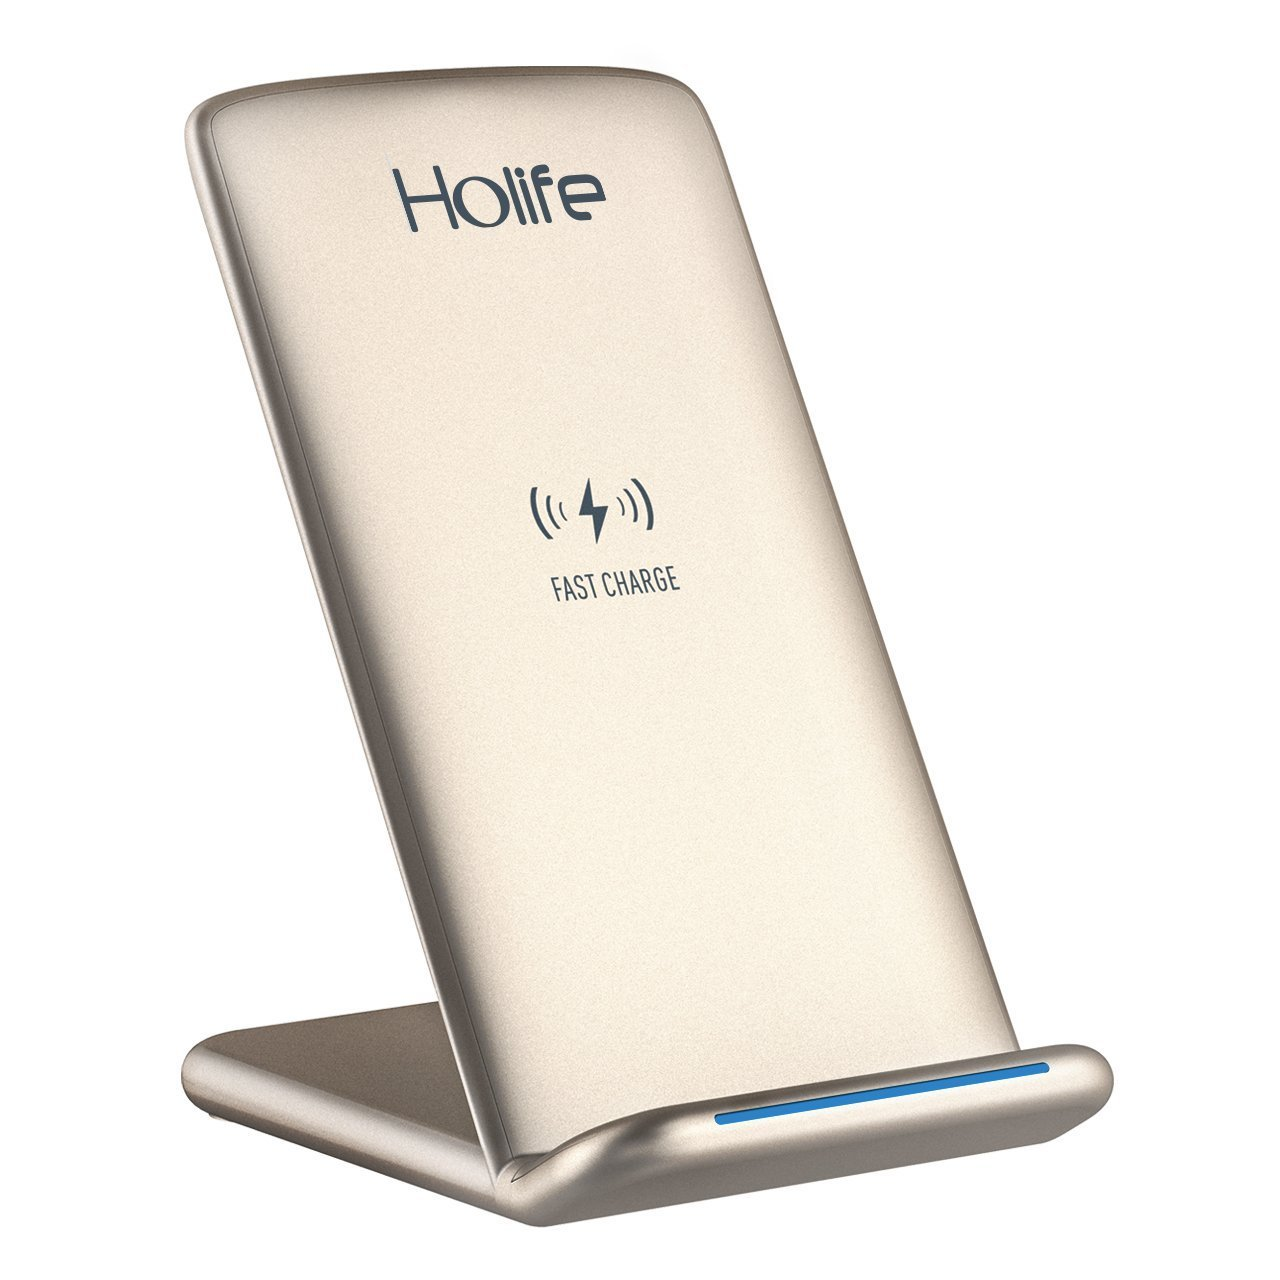 Qi Cargador Inalámbrico Rápido Holife Cargador Inalámbrico para Samsung Galaxy Note